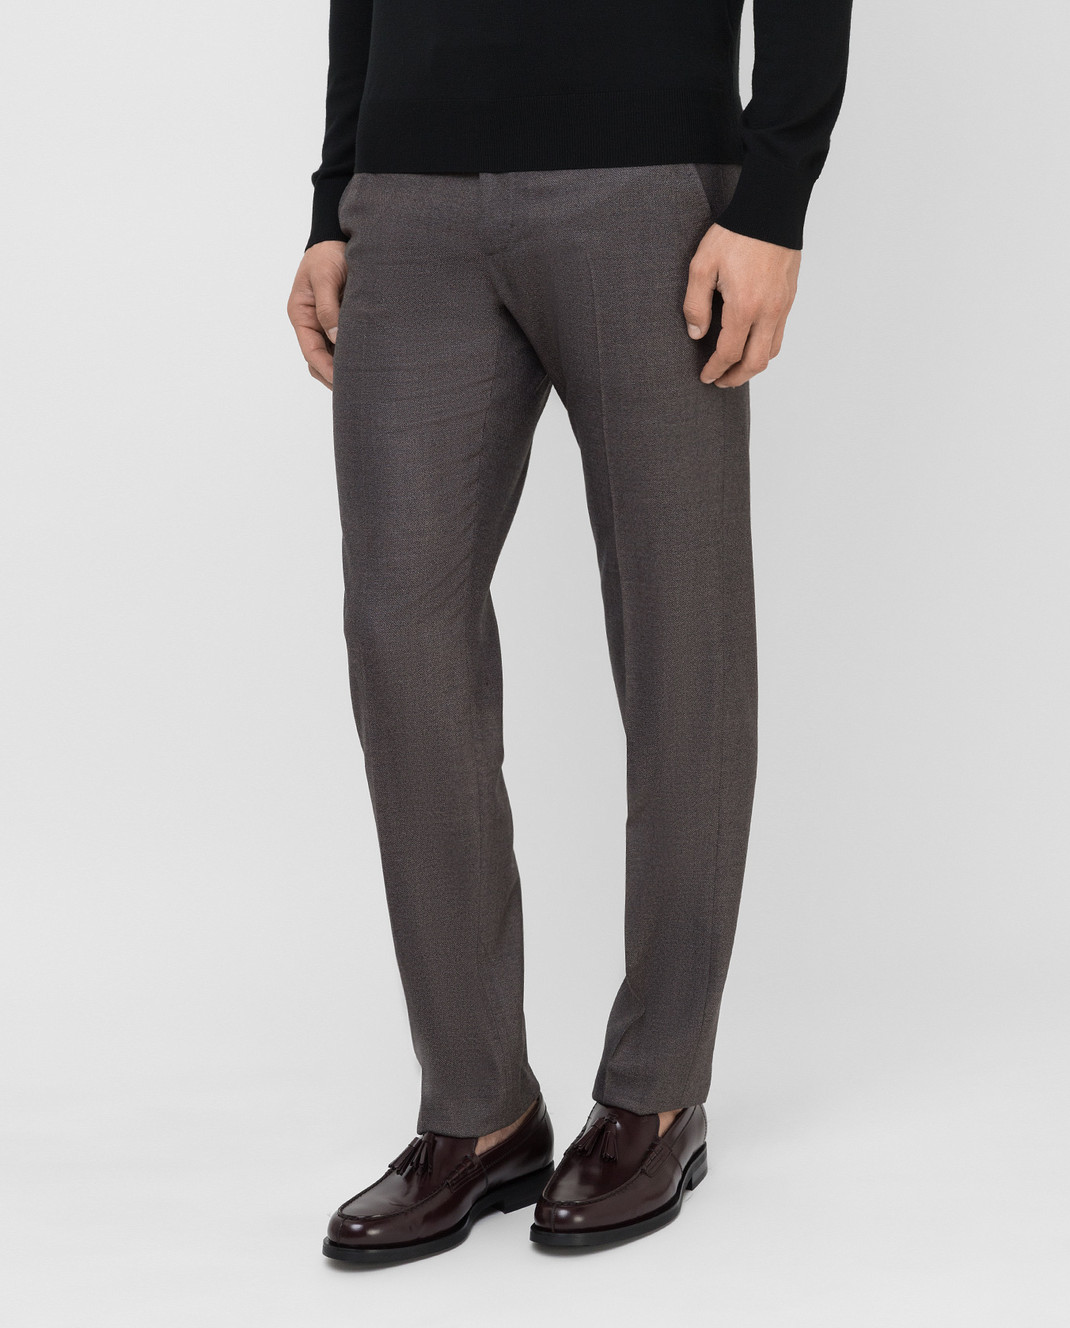 Stefano Ricci Темно-бежевые брюки из шерсти изображение 3